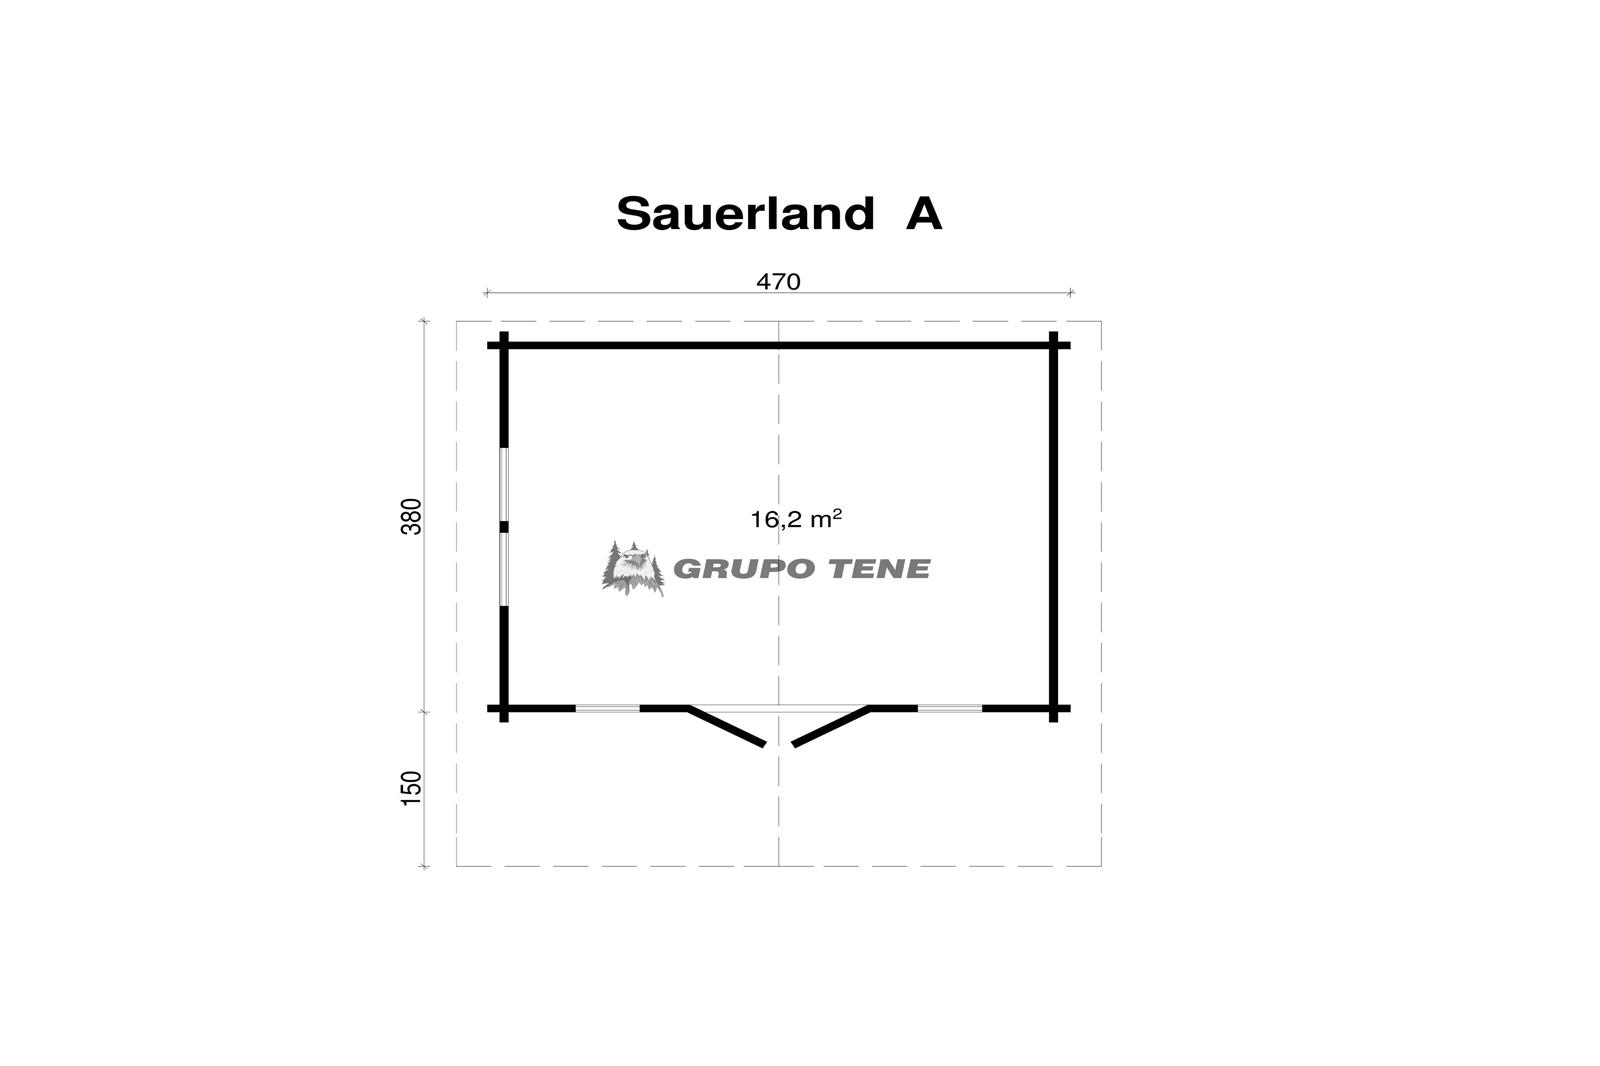 plano sauerland a